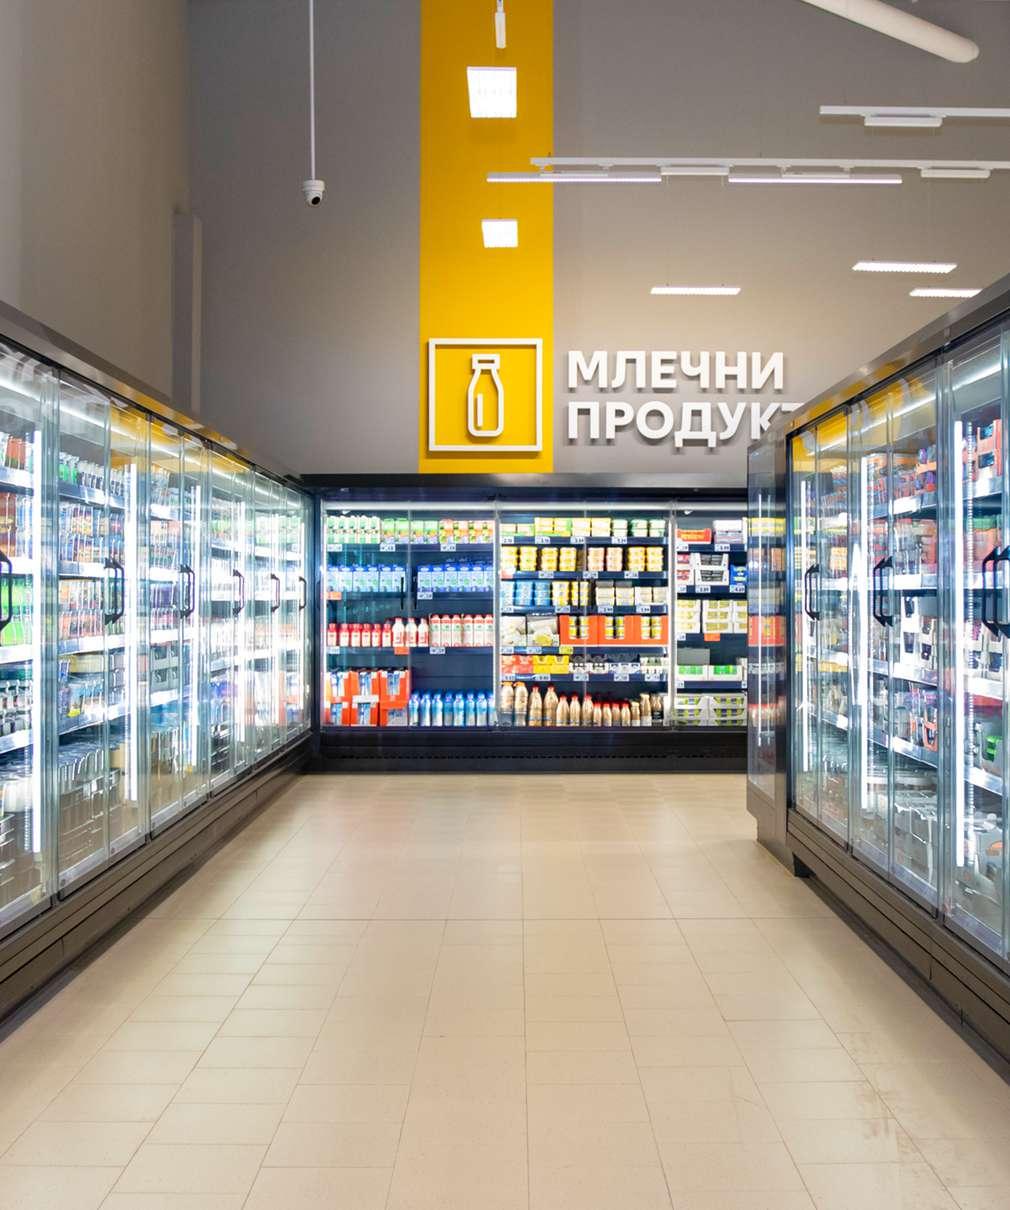 Изображение на хладилни витрини в хипермаркет Kaufland